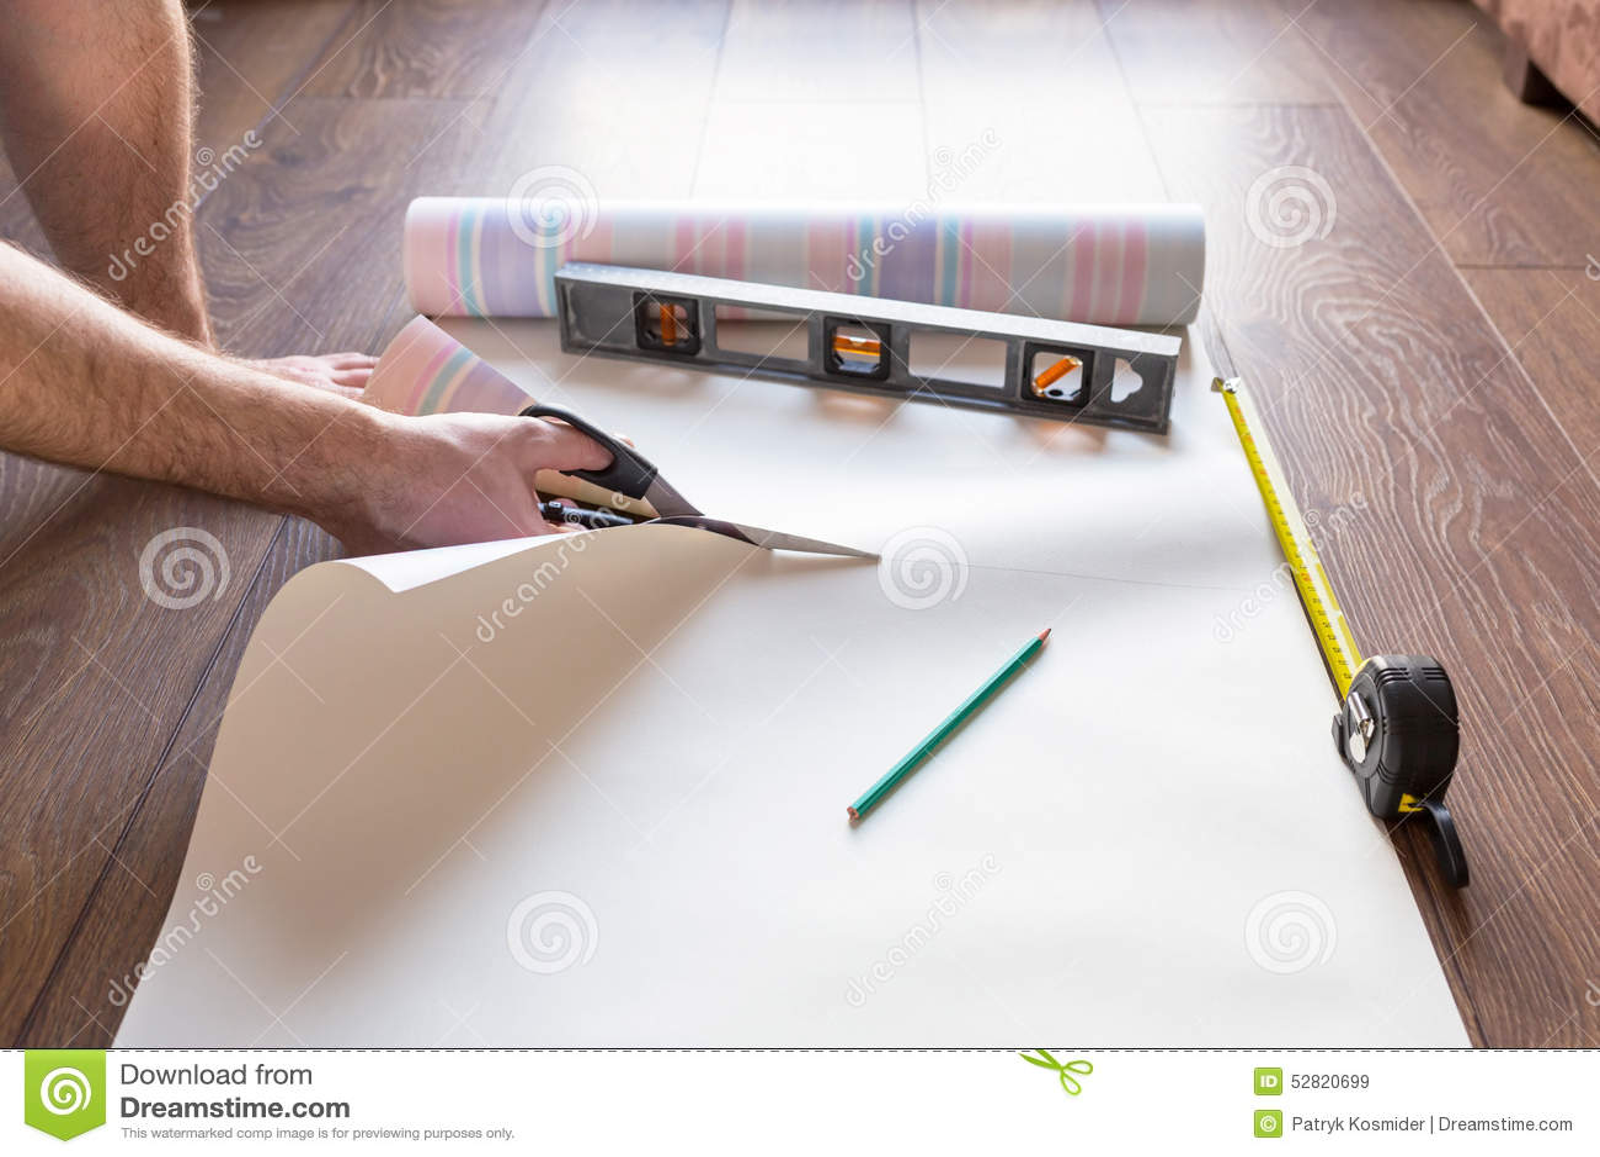 Handyman cutting wallpaper